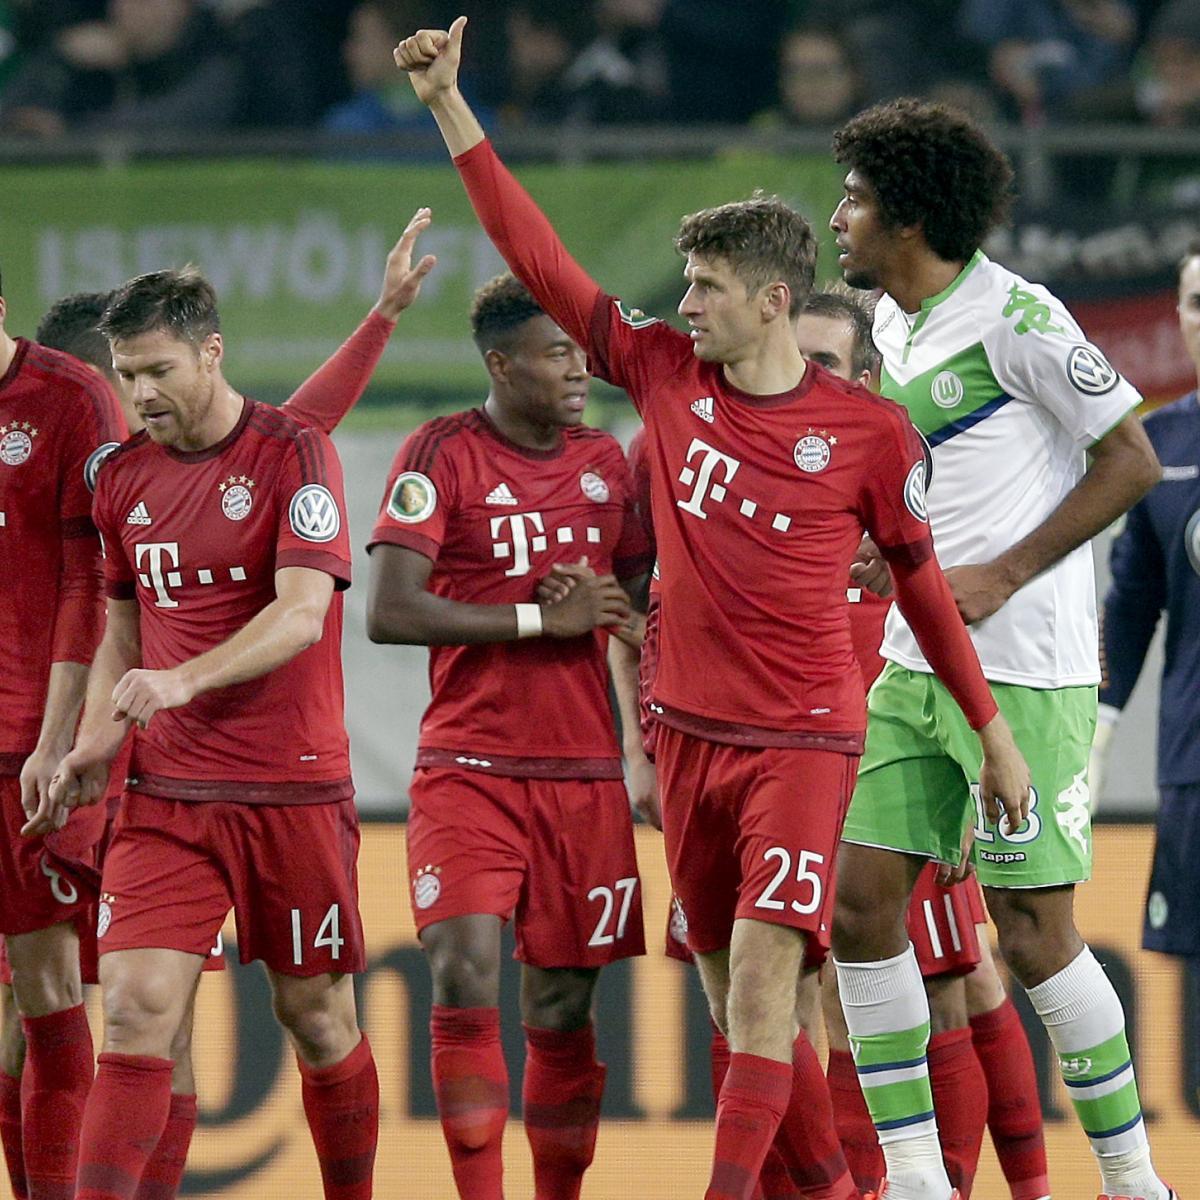 Champions League 2019 Round Of 16 Leg 2 Live Stream Tv: Wolfsburg Vs. Bayern Munich: Team News, Preview, Live